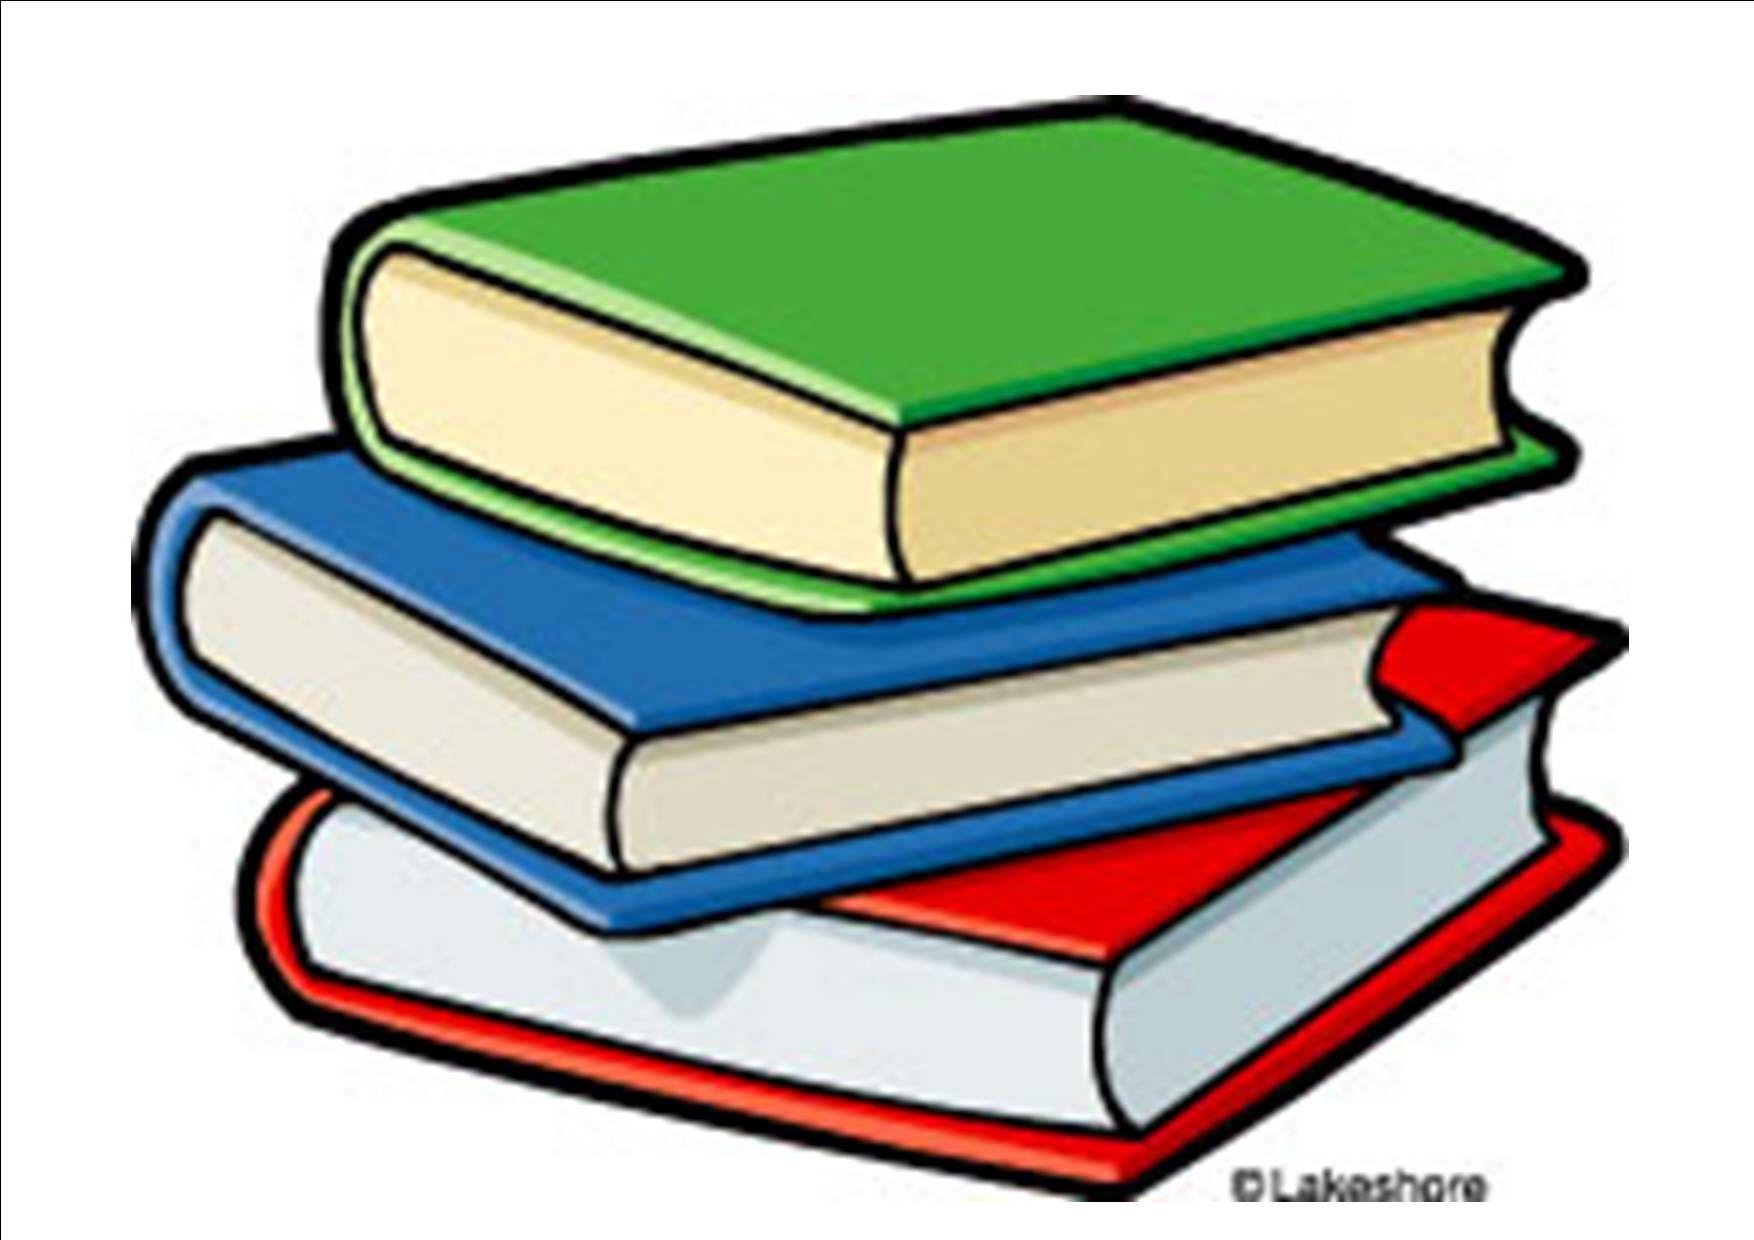 clip art freeuse download Teacher panda free images. Books clipart.